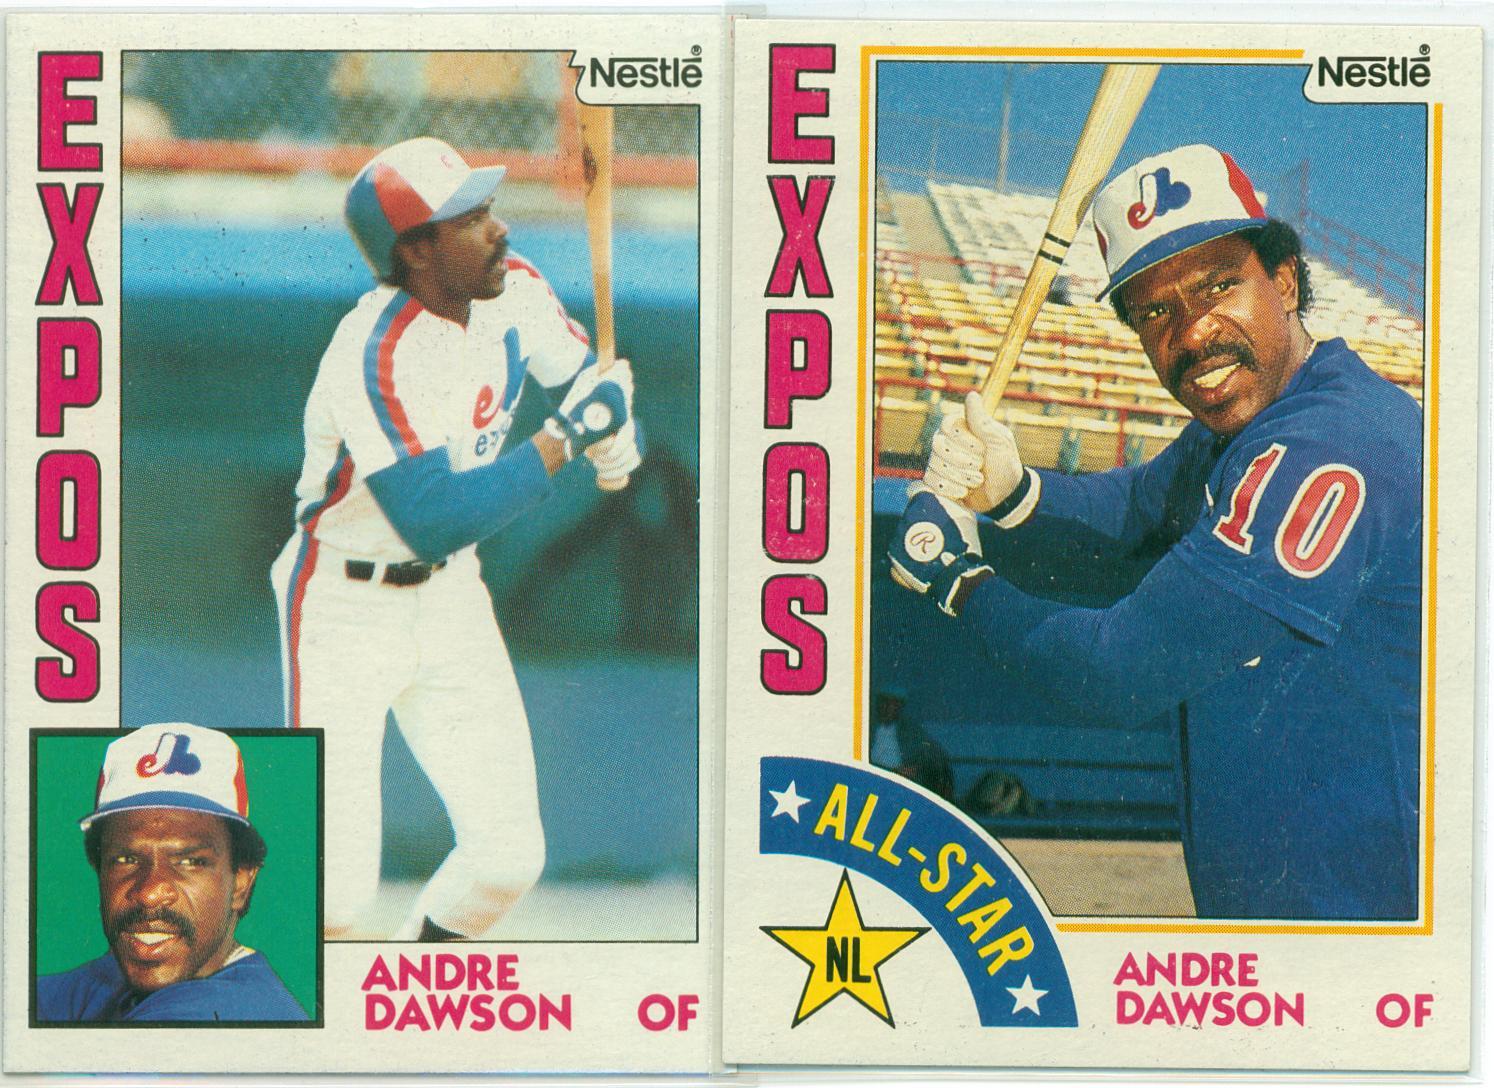 Andre Dawson 1984 Nestle Baseball Cards Base All Star